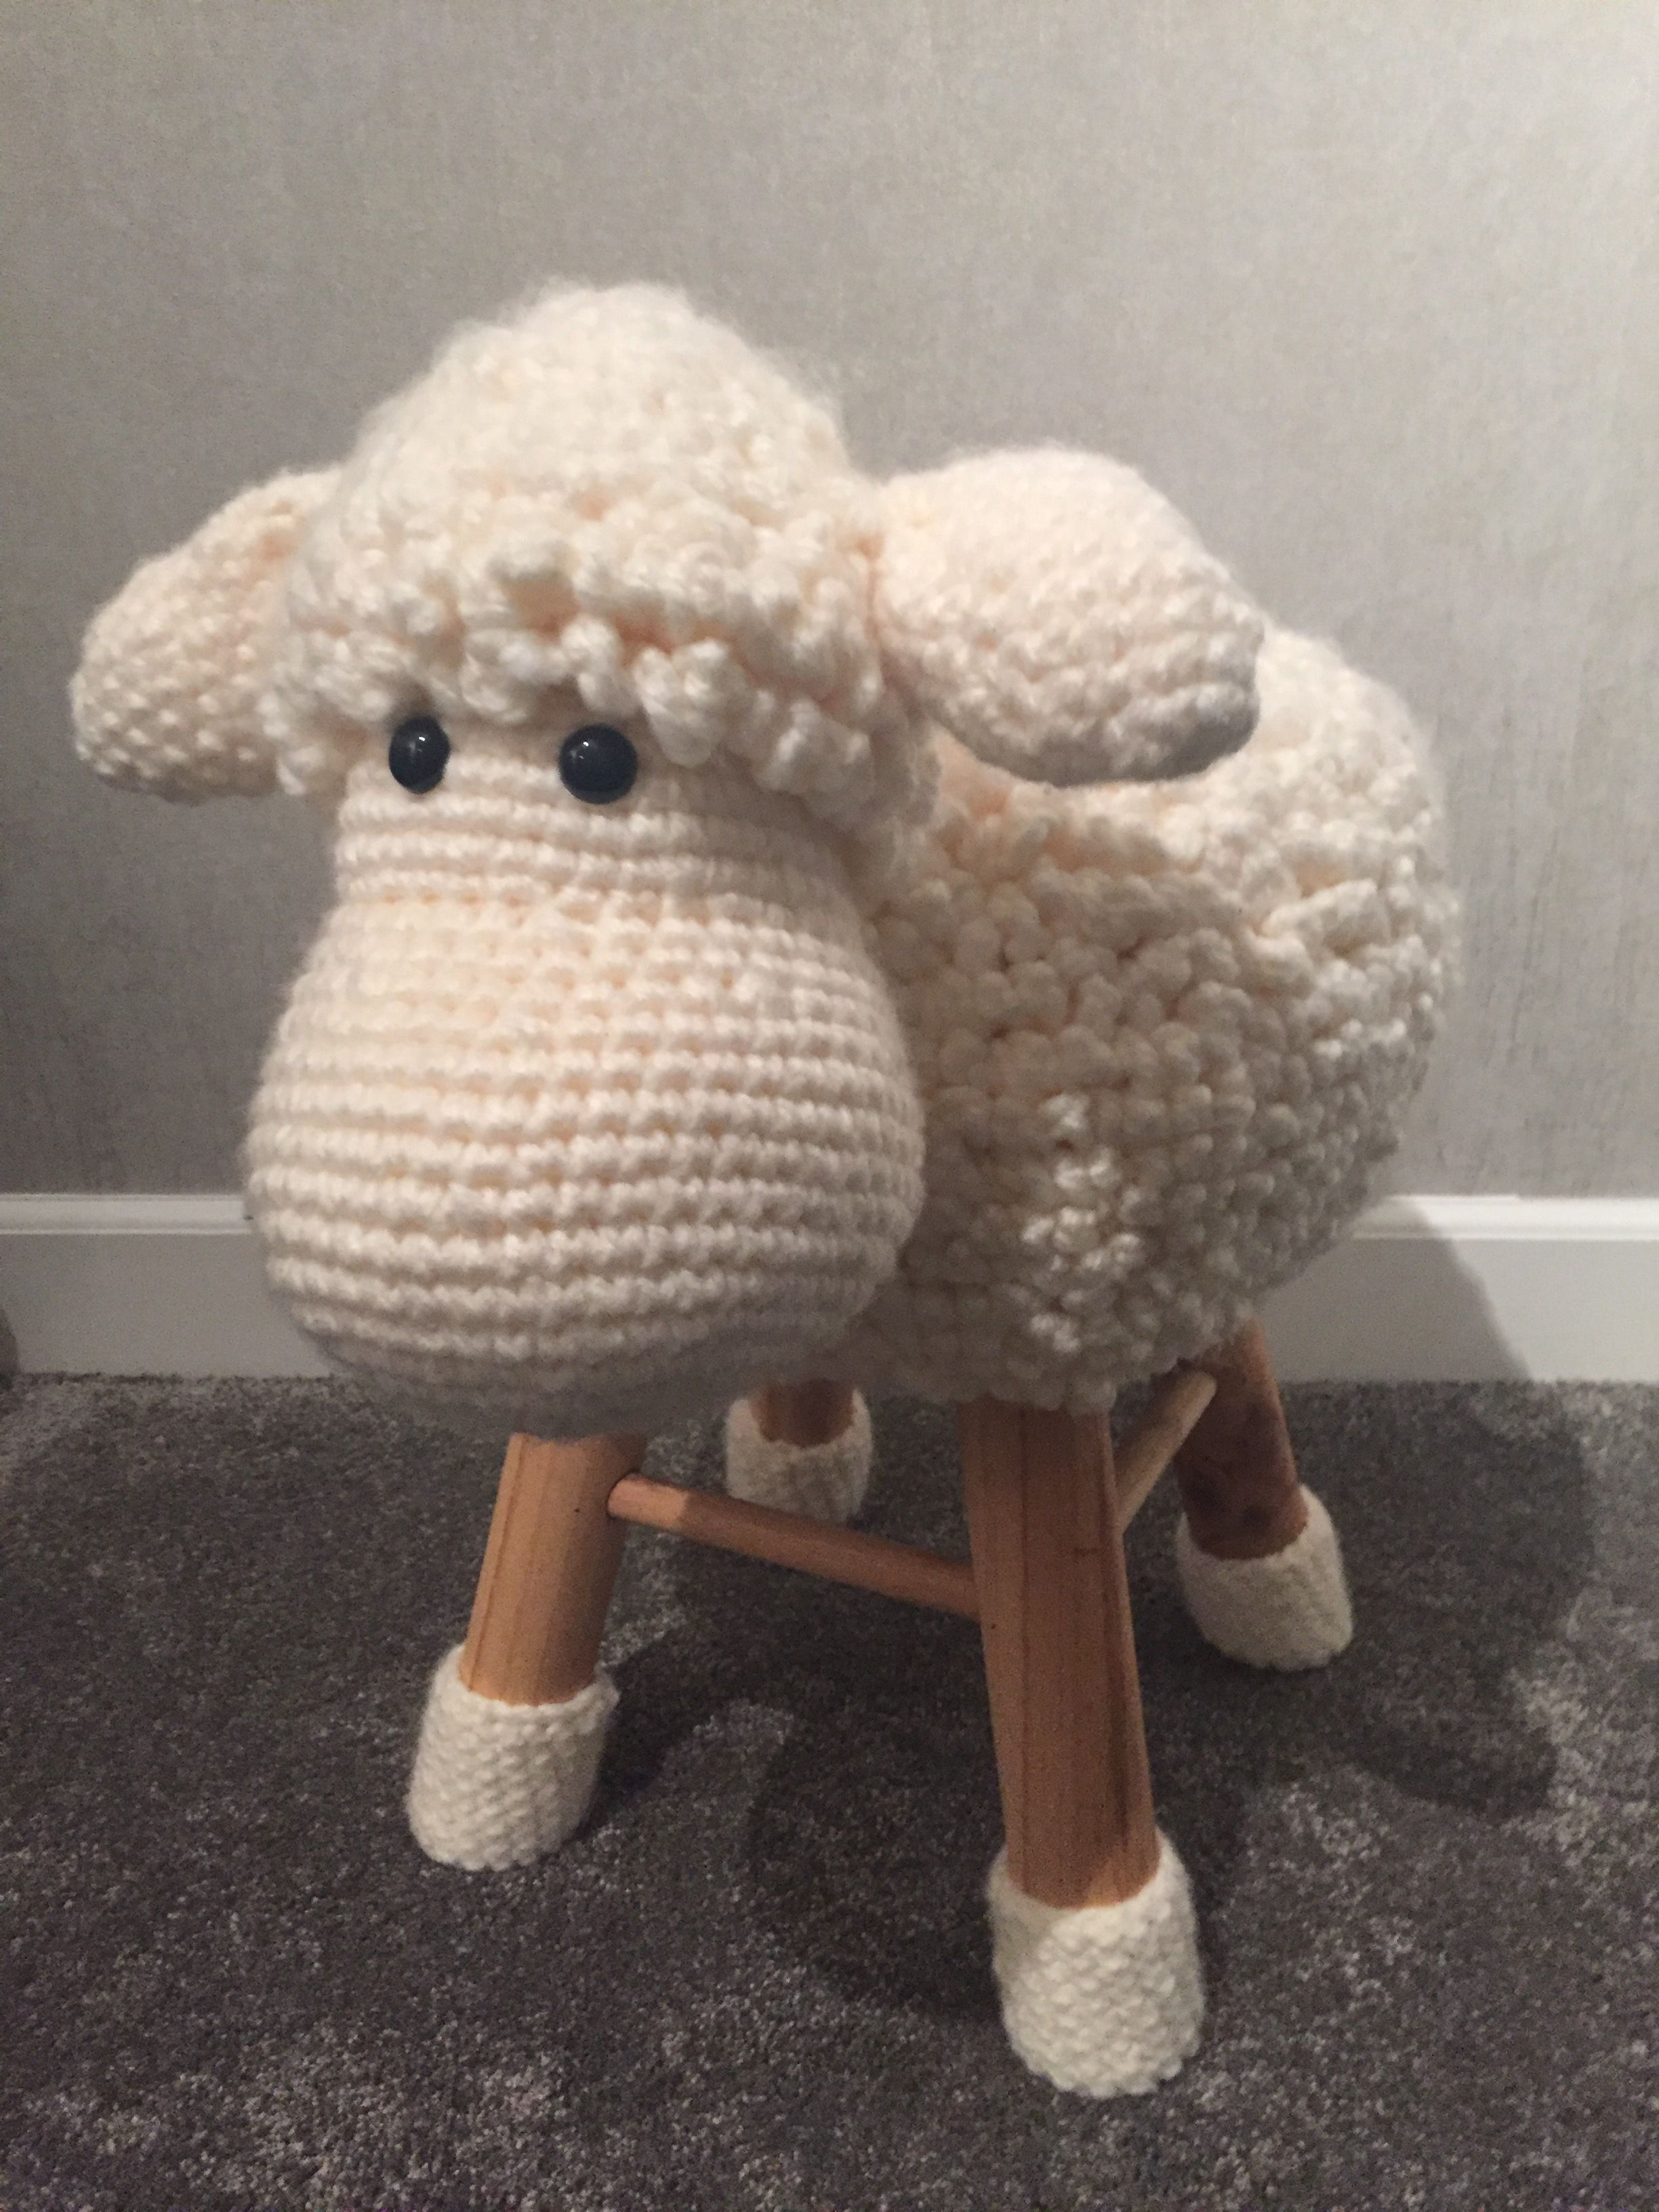 Handmade Schaap Krukje Patroon Hobbeldieren Crochet I Like